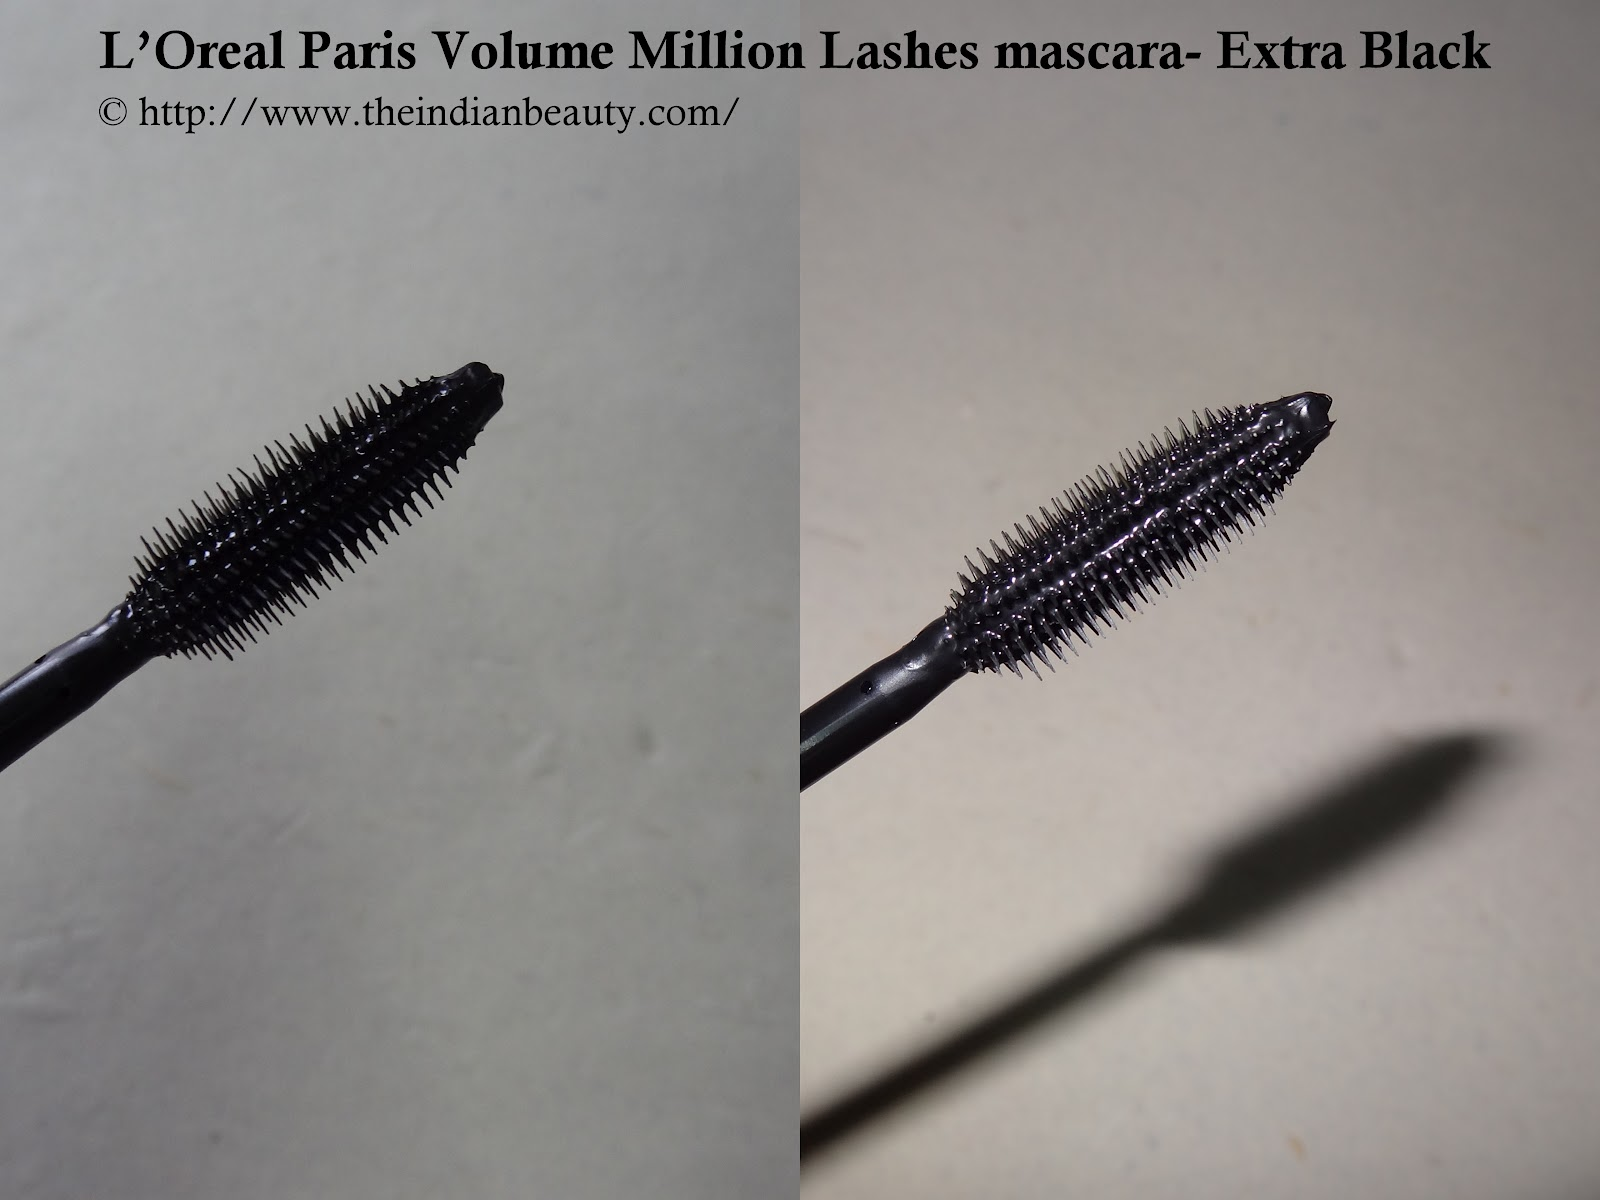 a3f95321ca7 L'Oreal Paris Volume Million Lashes mascara- Extra Black: Review ...